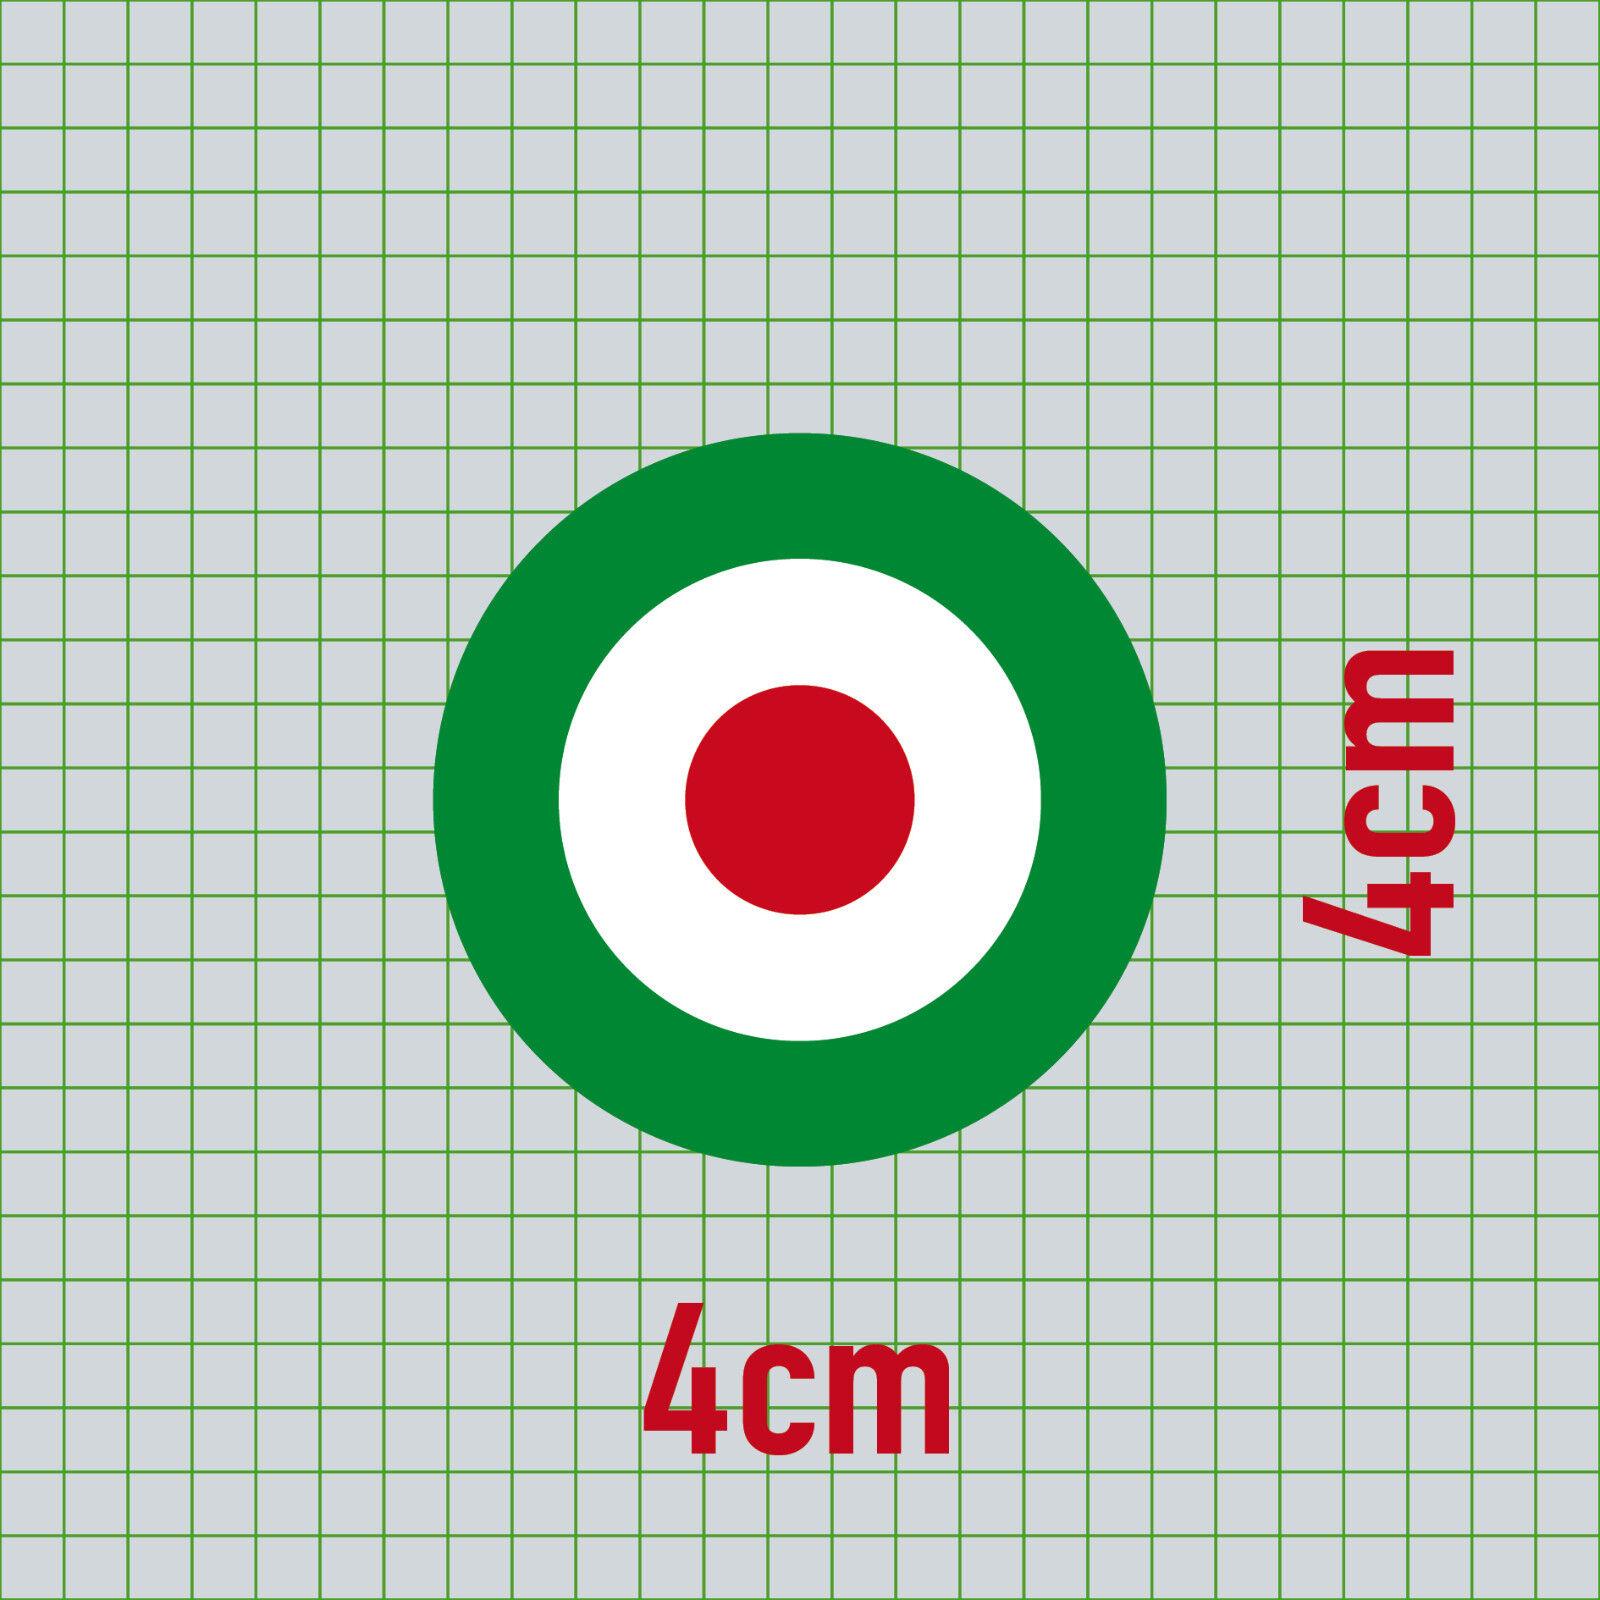 Aufkleber 4cm Sticker Decal Ita Italien Target Mod Scooter Vespa Roller Helm